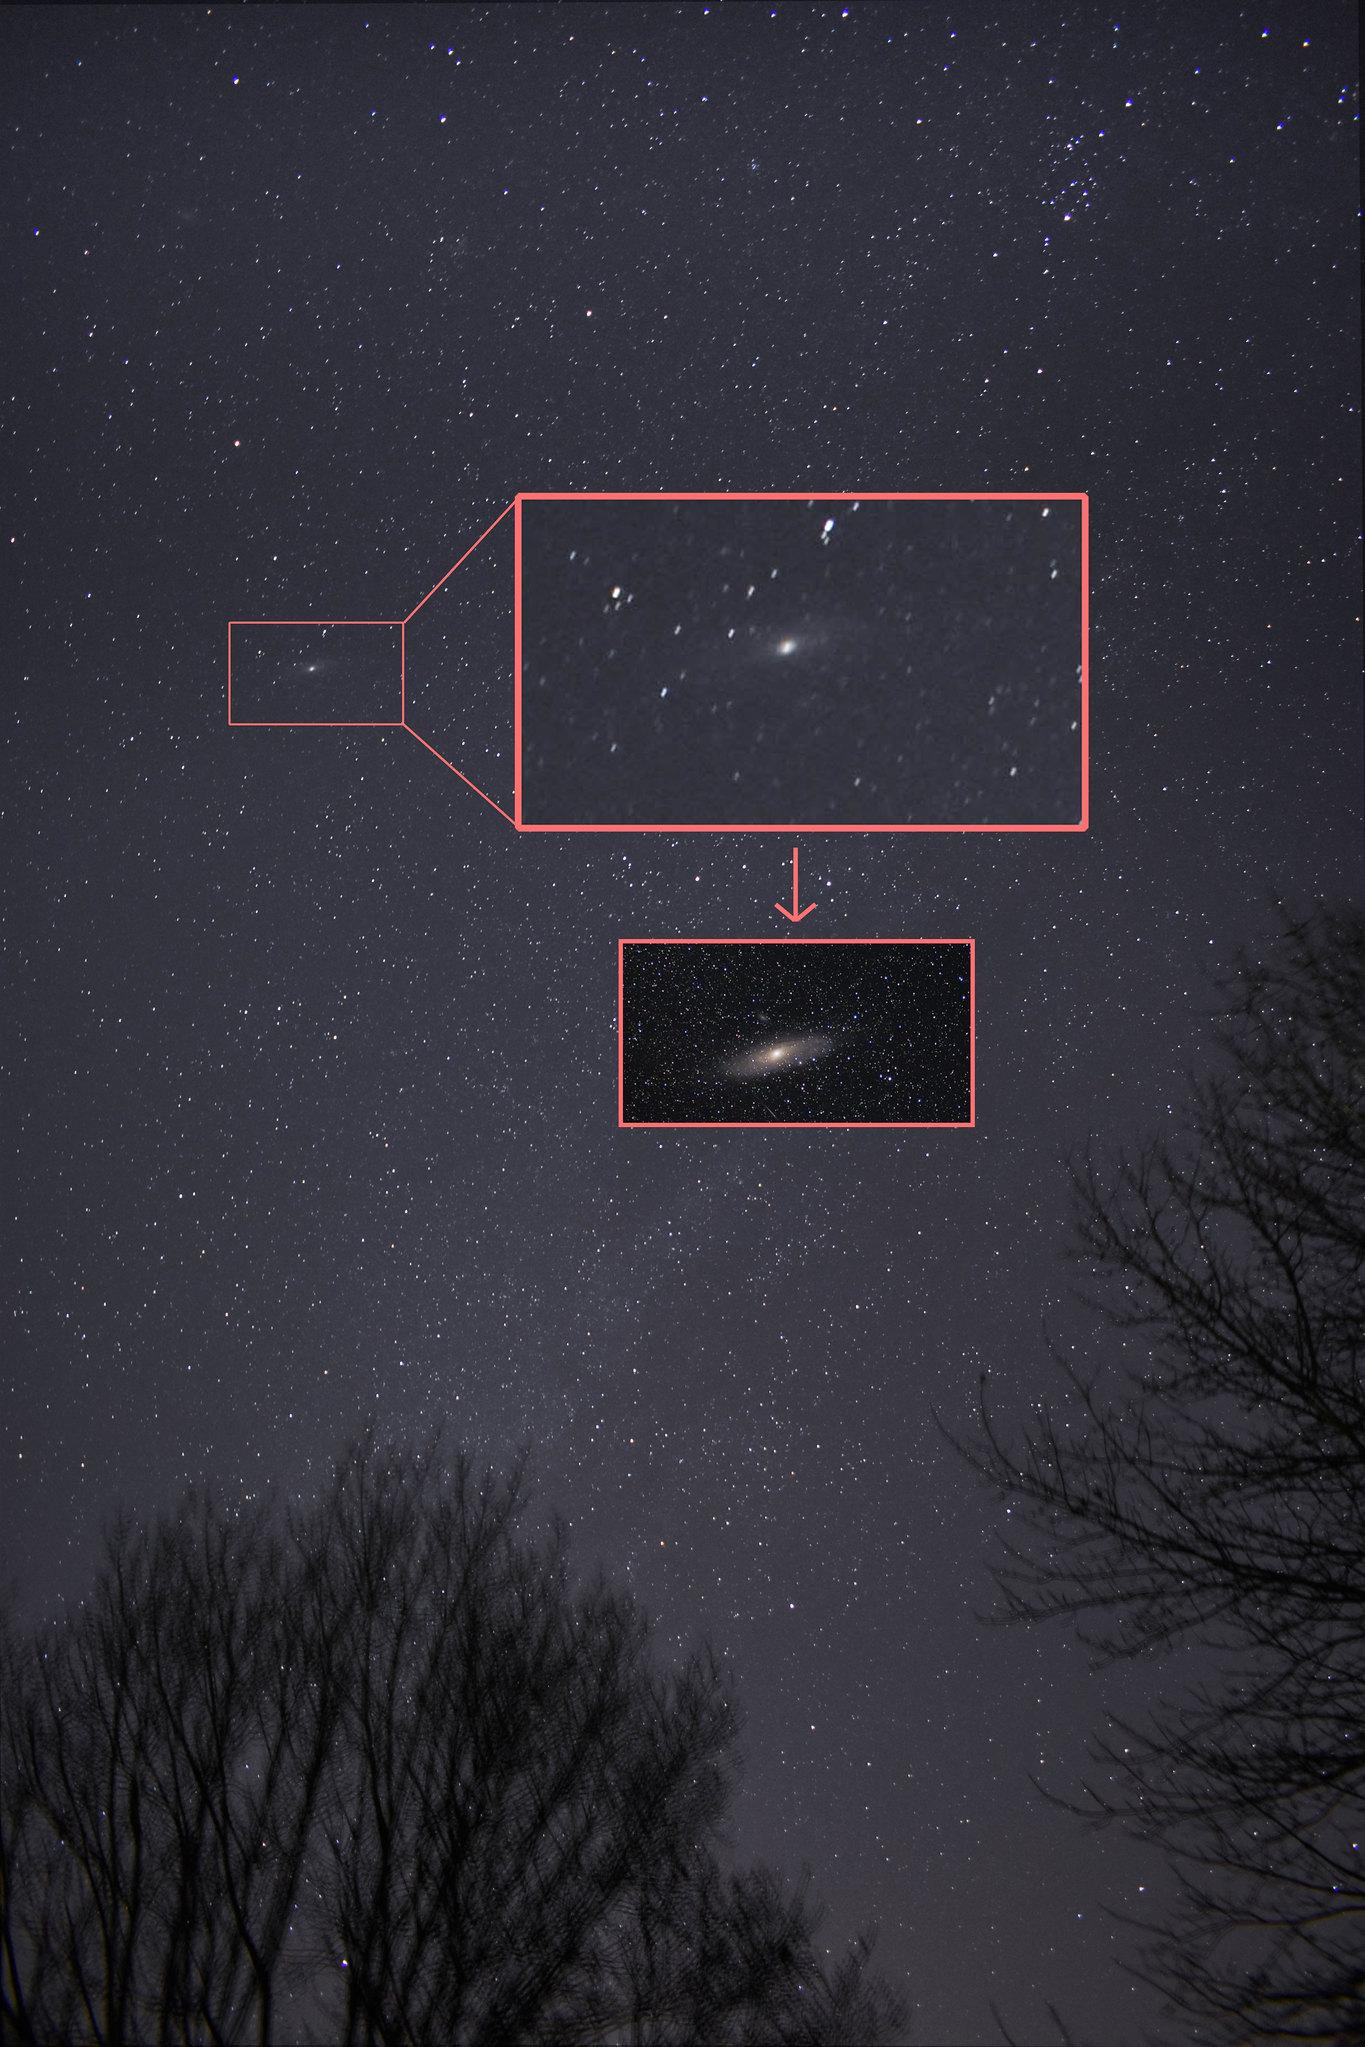 M31 in widefield - December '17